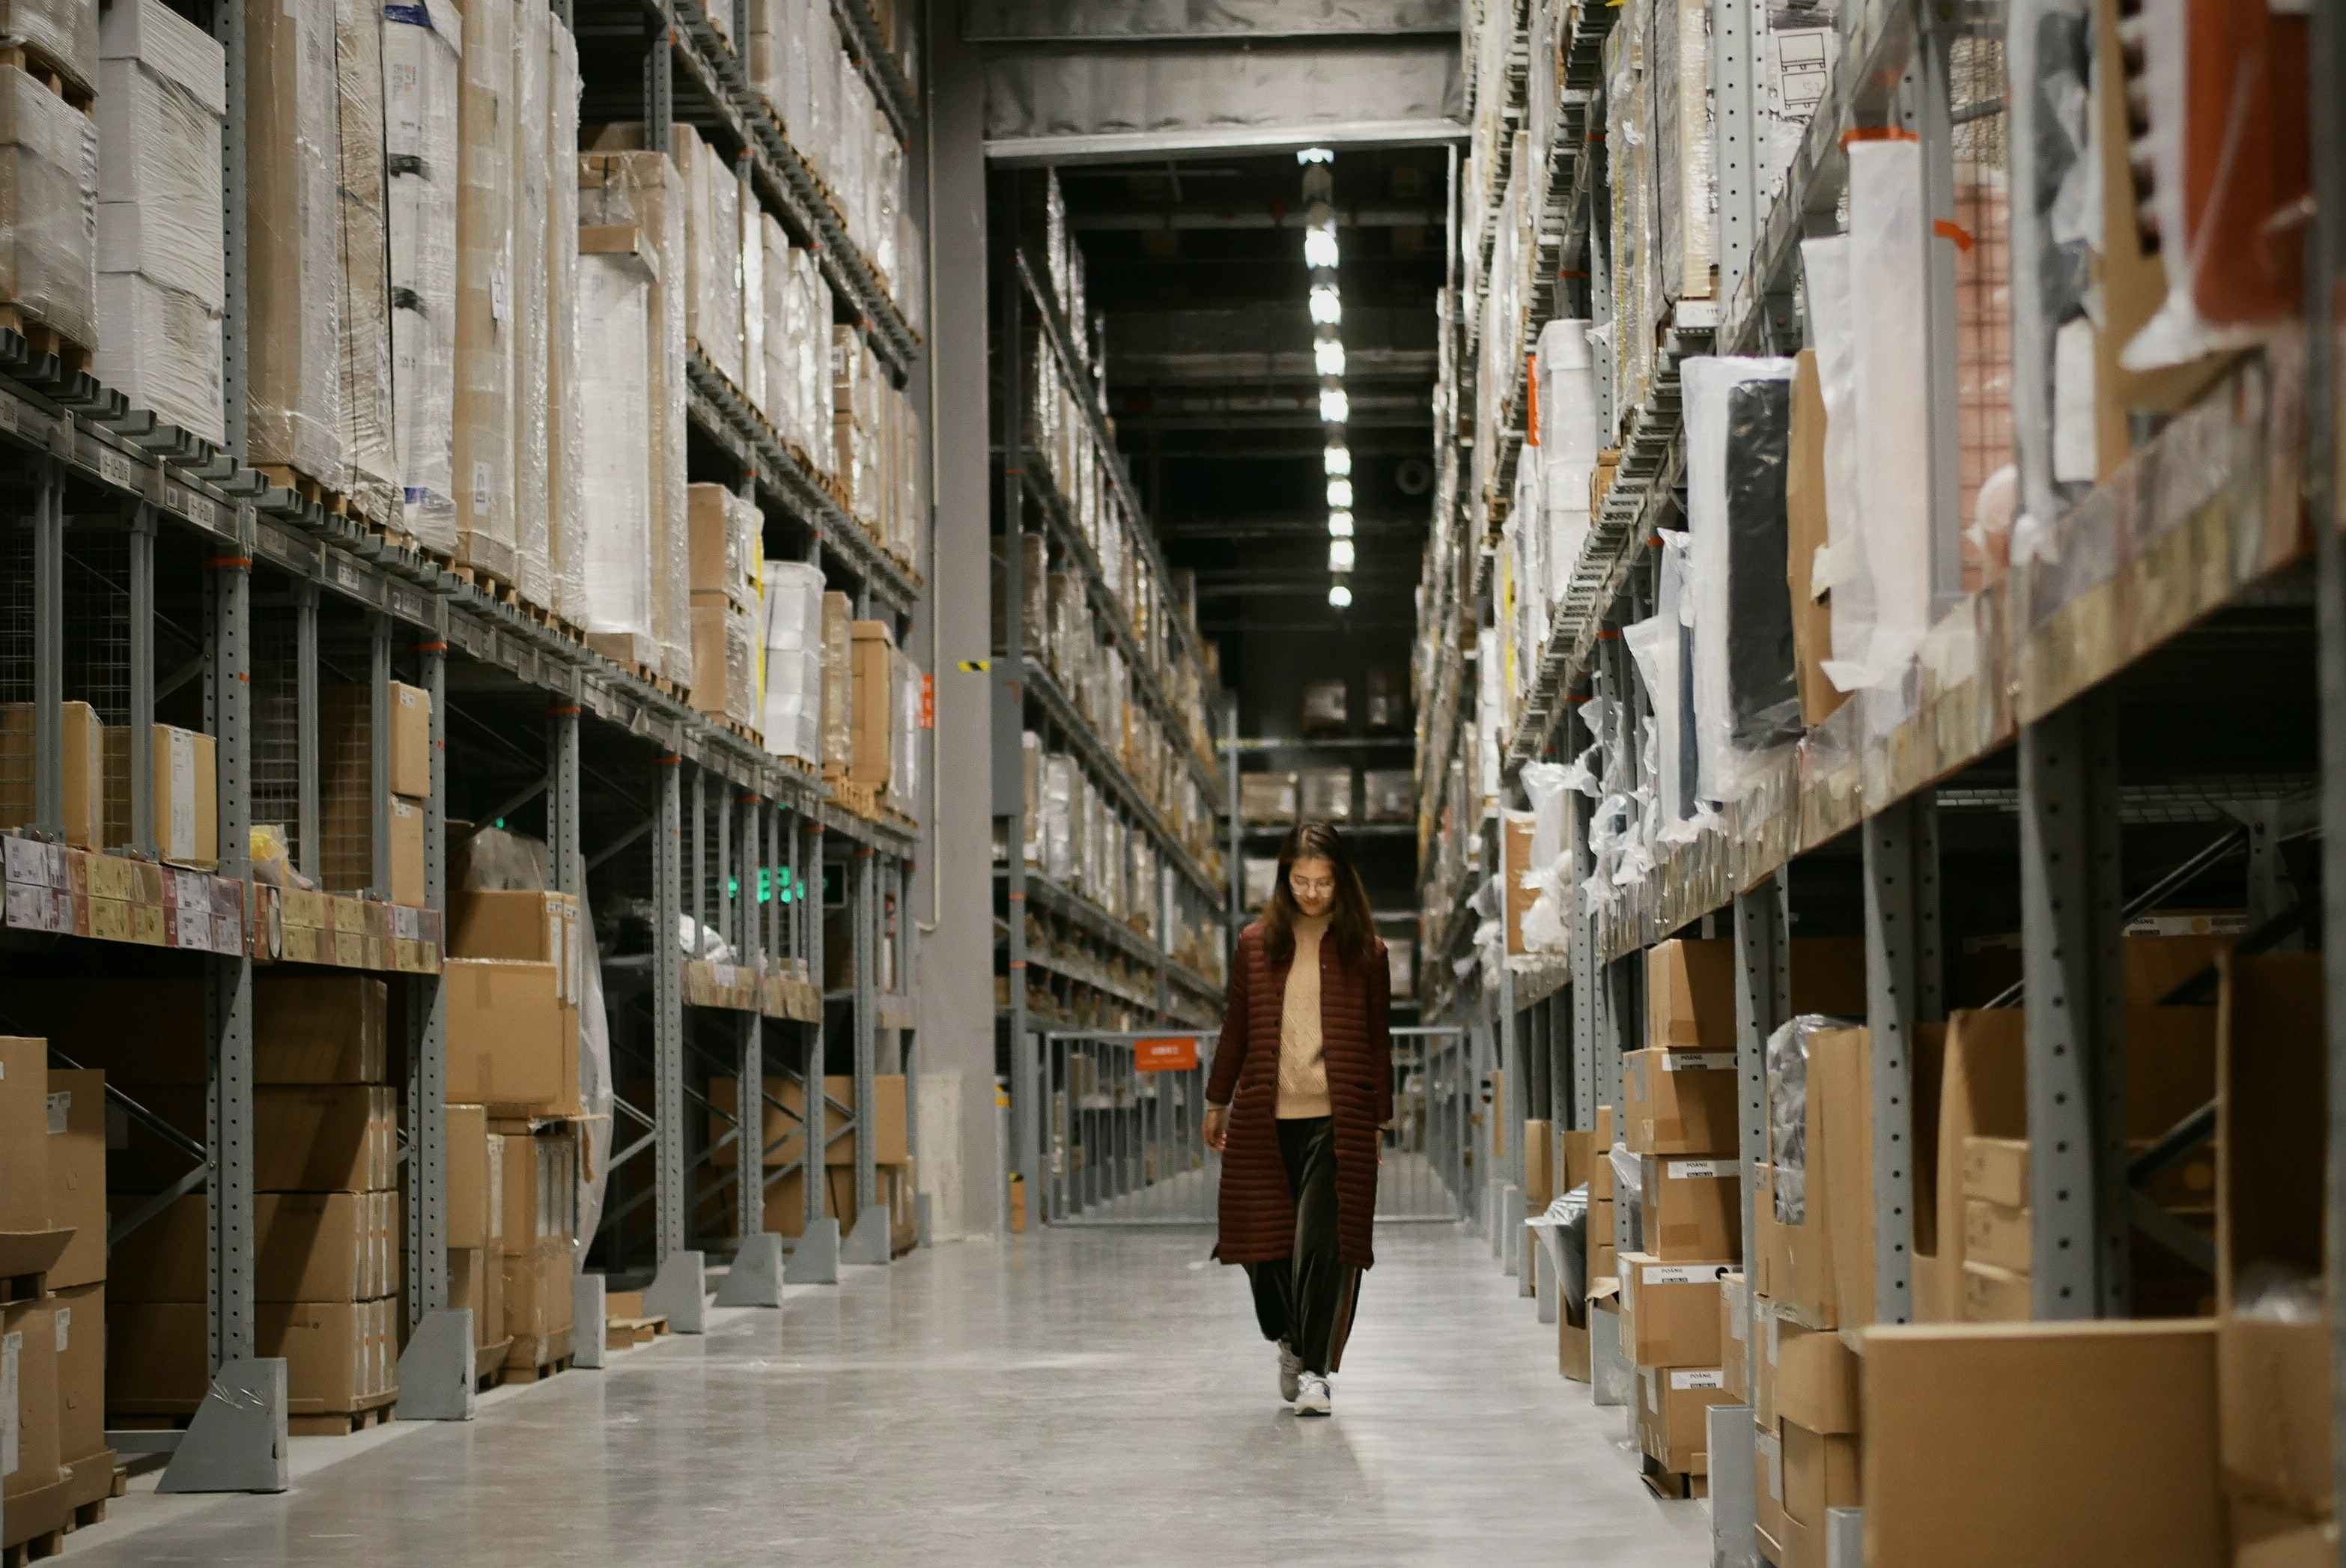 girl walking through warehouse Photo by Sikai Gu on Unsplash